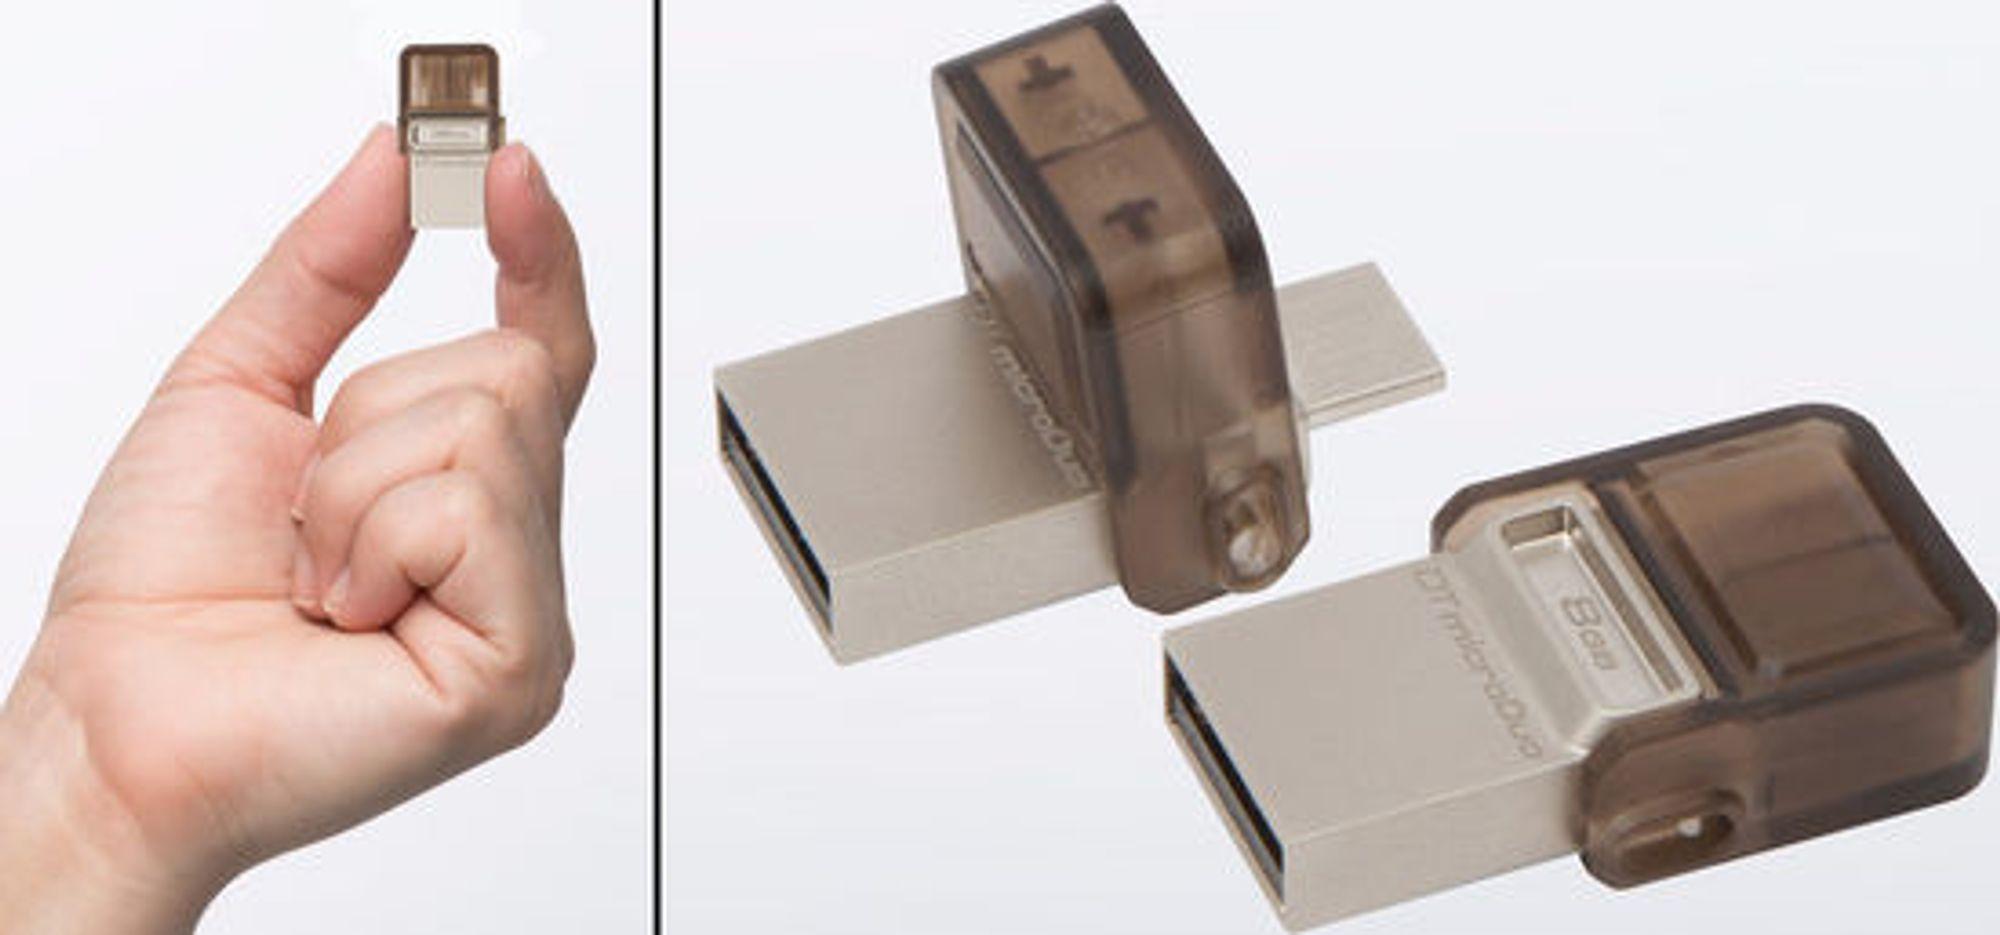 MicroDuo har beskjedne ytre mål. Konstruksjonen verner om micro-USB-pluggen.